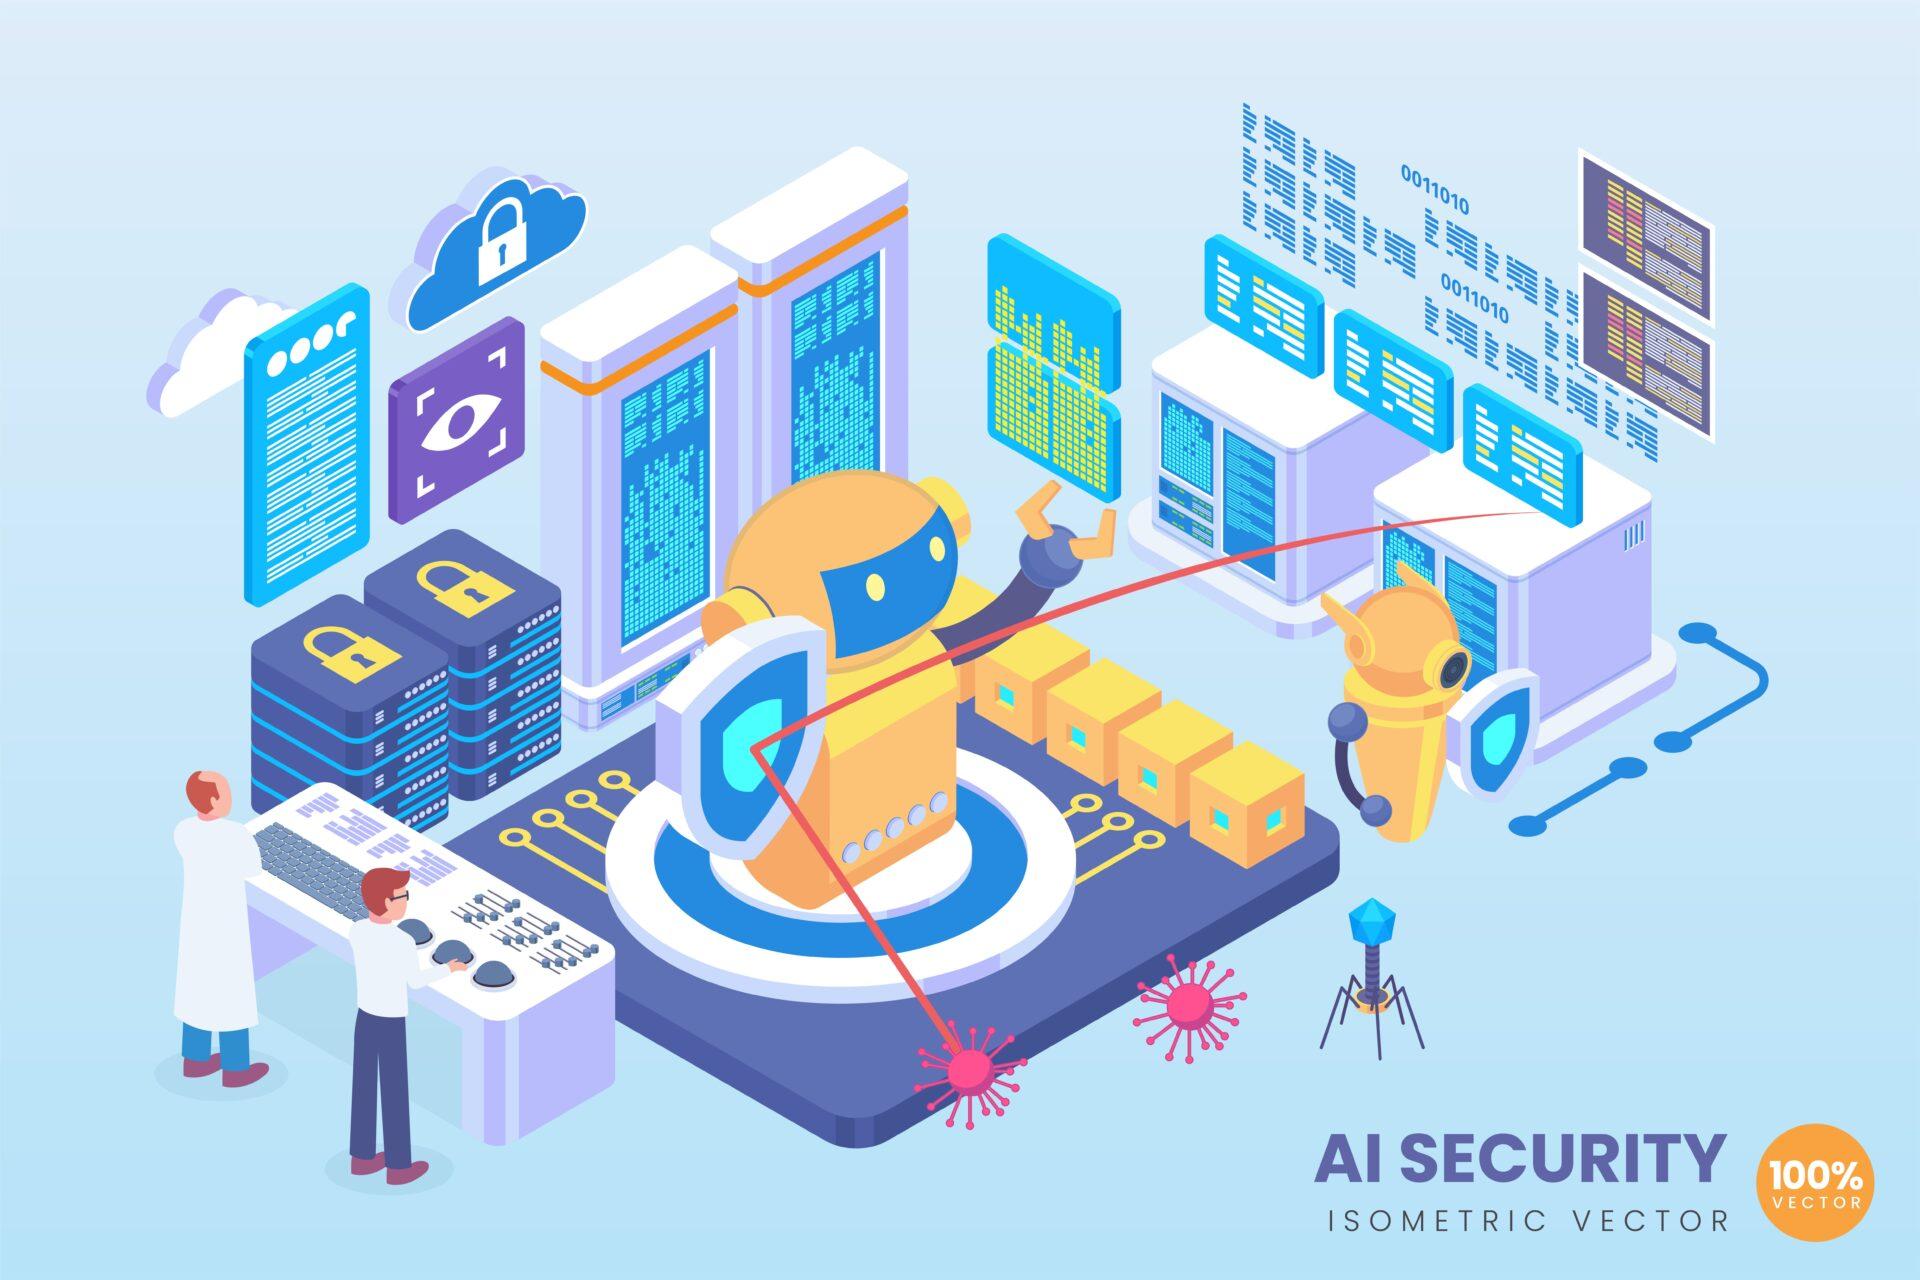 AIのビジネスへの応用事例